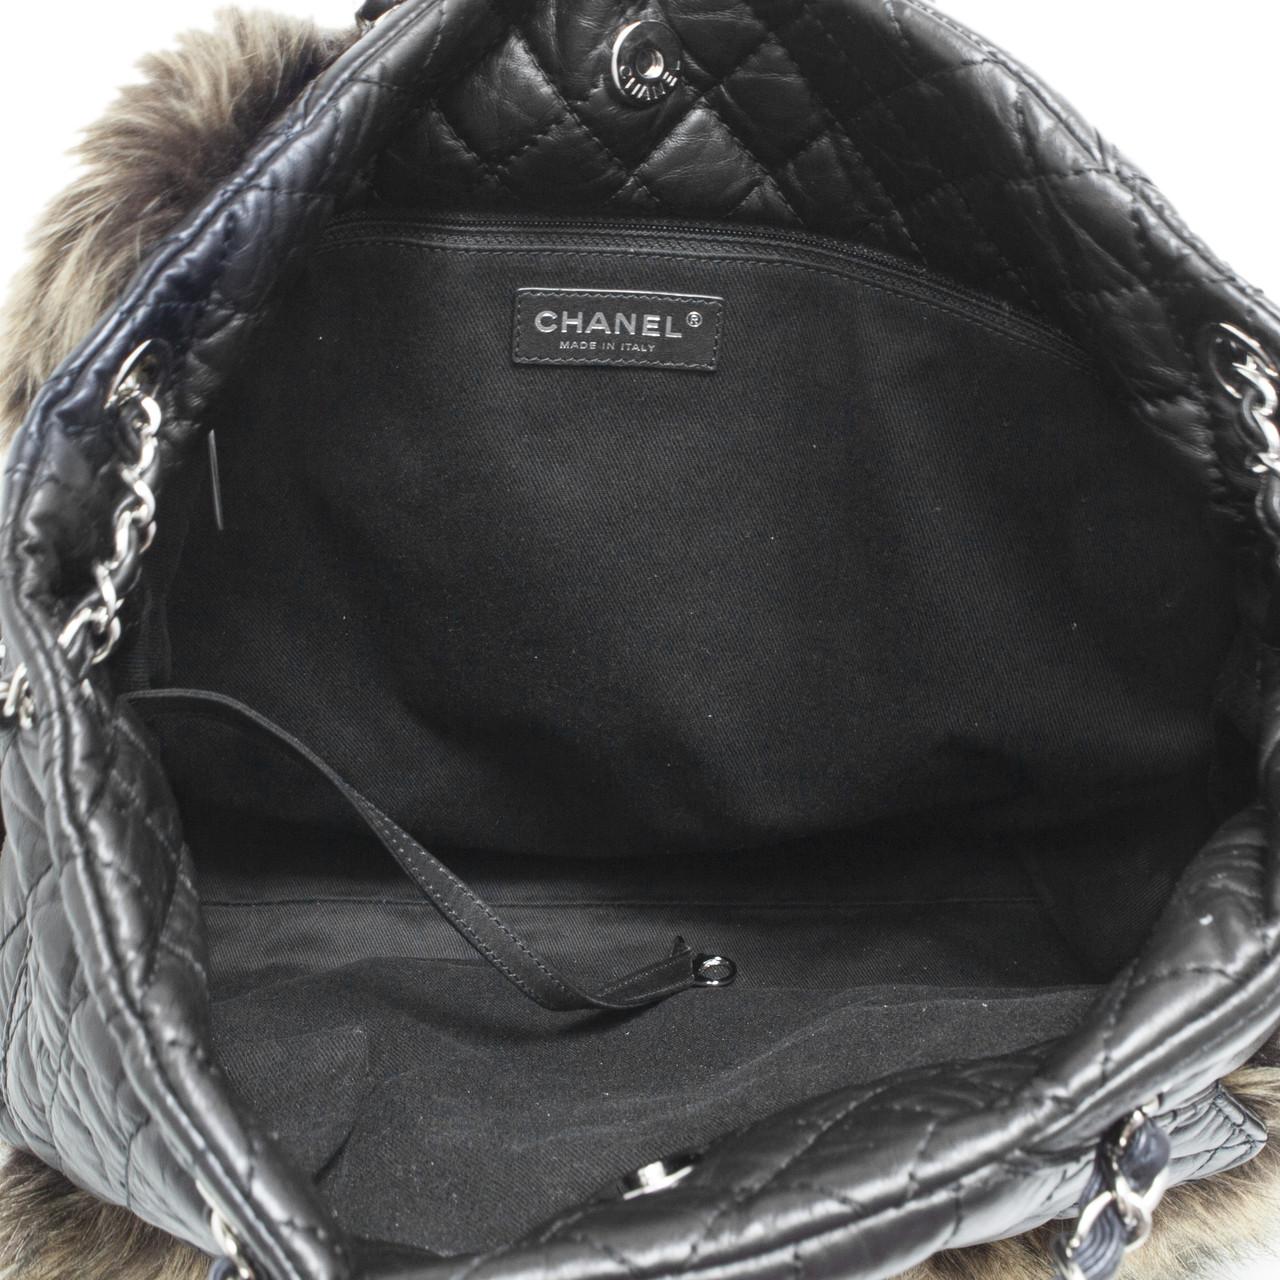 541088fc6124a1 Chanel Black Aged Calfskin Fantasy Fur Karl's Cabas Tote - modaselle